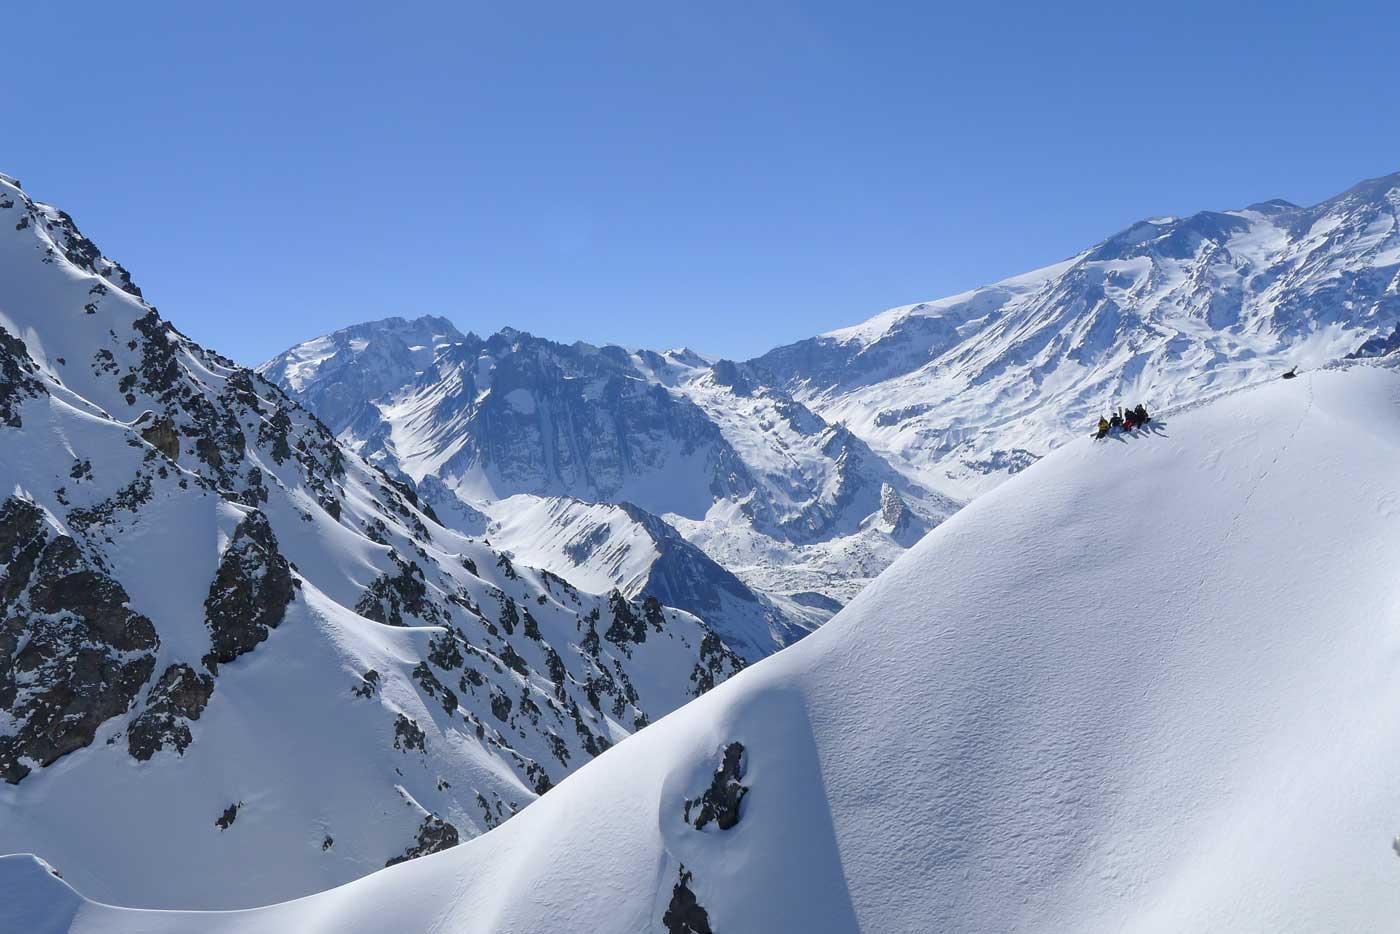 Cajon del Maipo full day guided skiing program